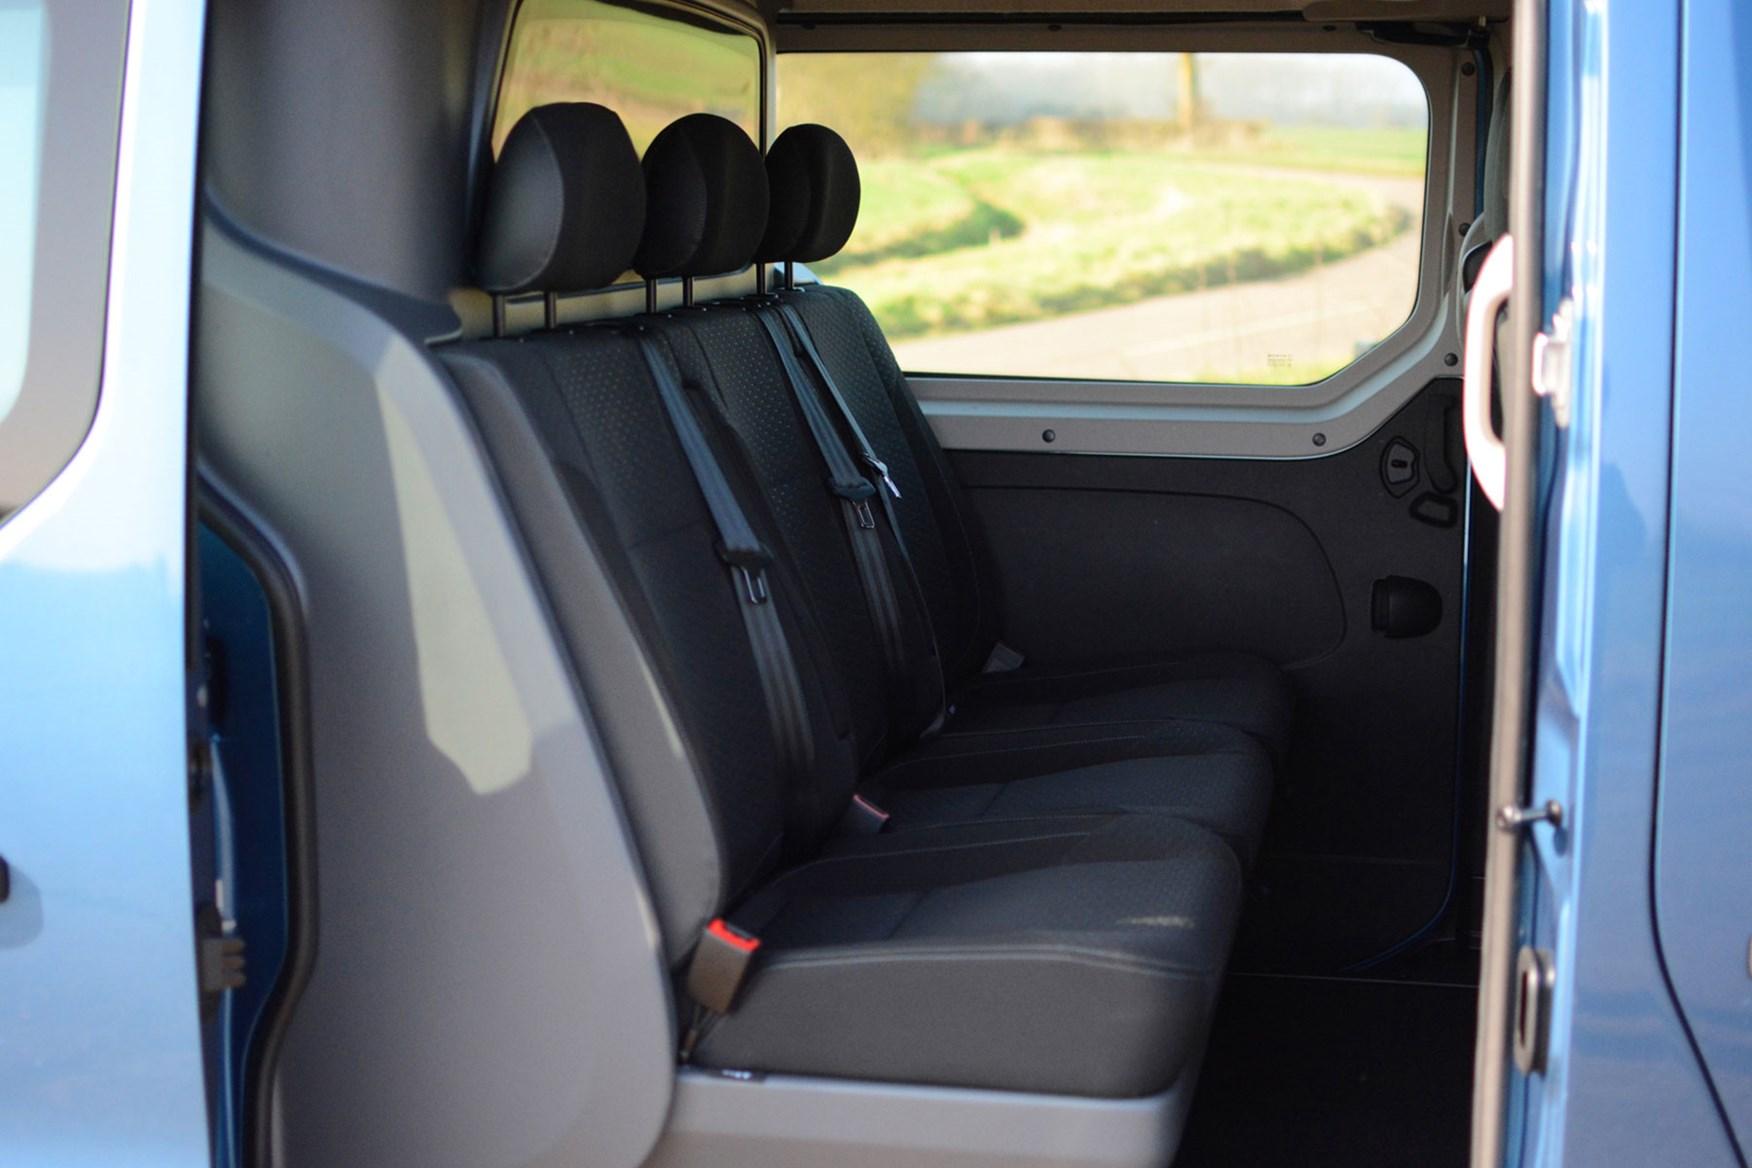 Vauxhall Vivaro Doublecab Sportive review - rear seats